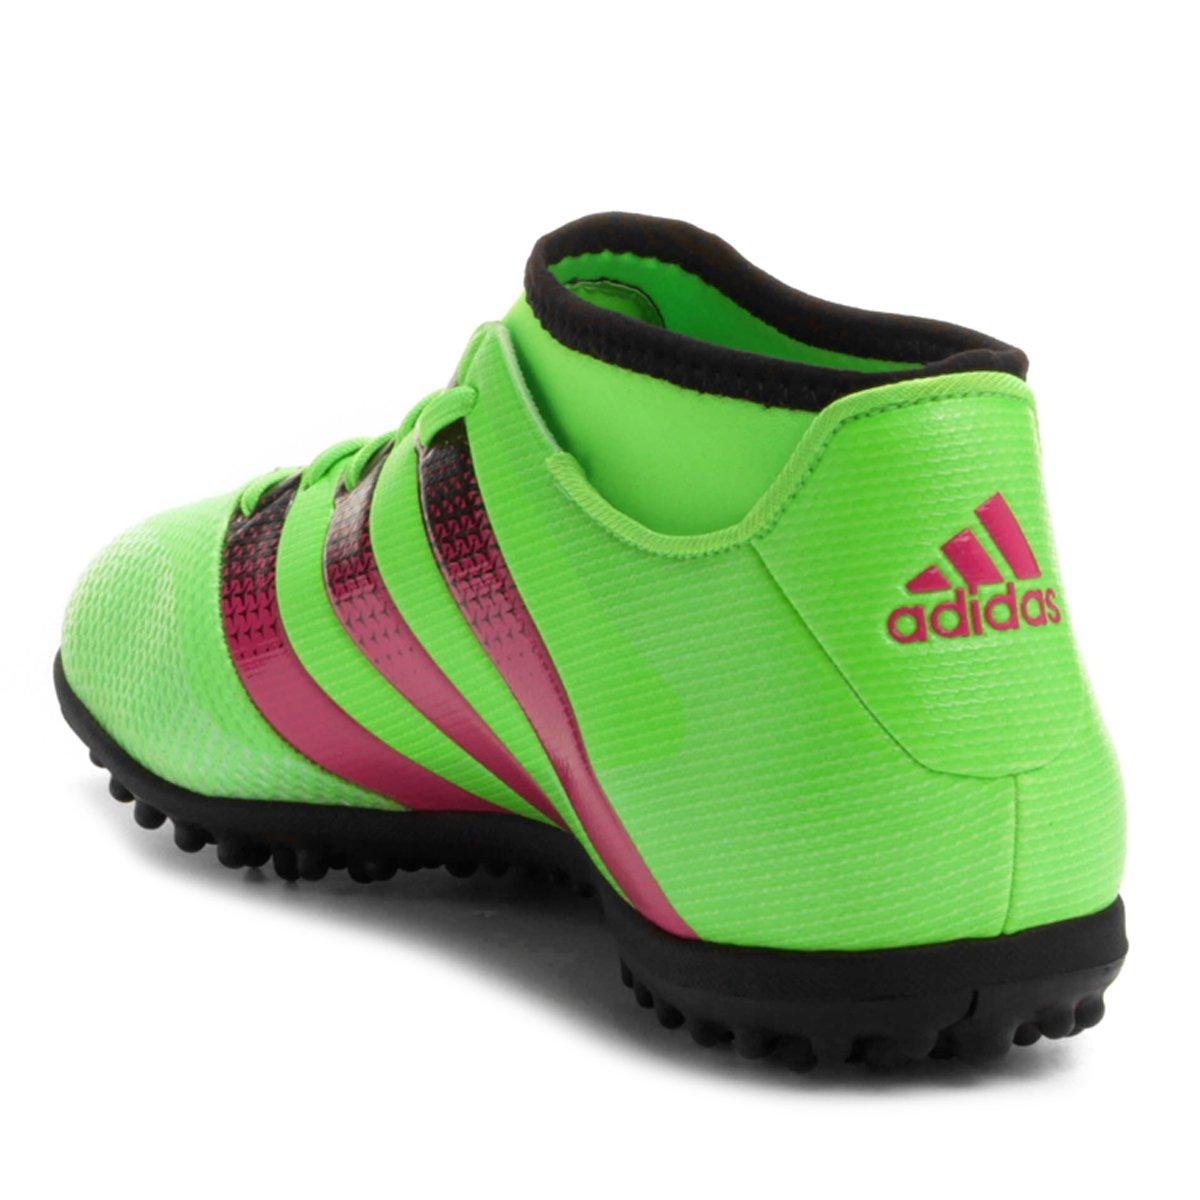 4b67a16c05 Chuteira Society Adidas Ace 16.3 Primemesh TF Masculina - Compre ...